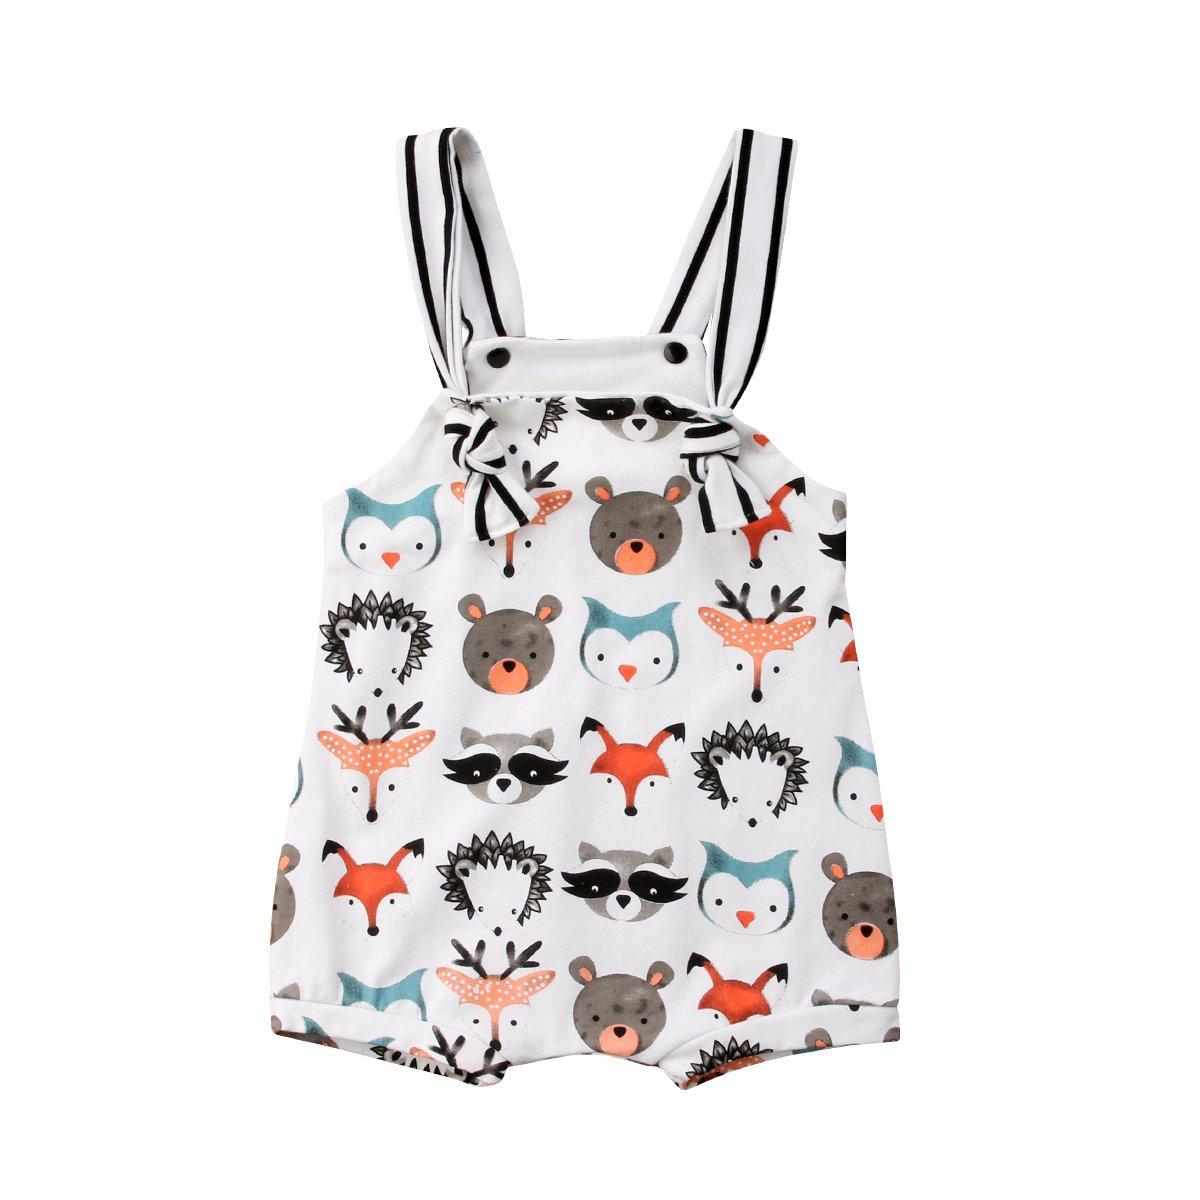 Honganda Cute Newborn Baby Girl Boy Animal Print Sleeveless Romper Jumpsuit One-Piece Bodysuit (White, 6-12 Months)